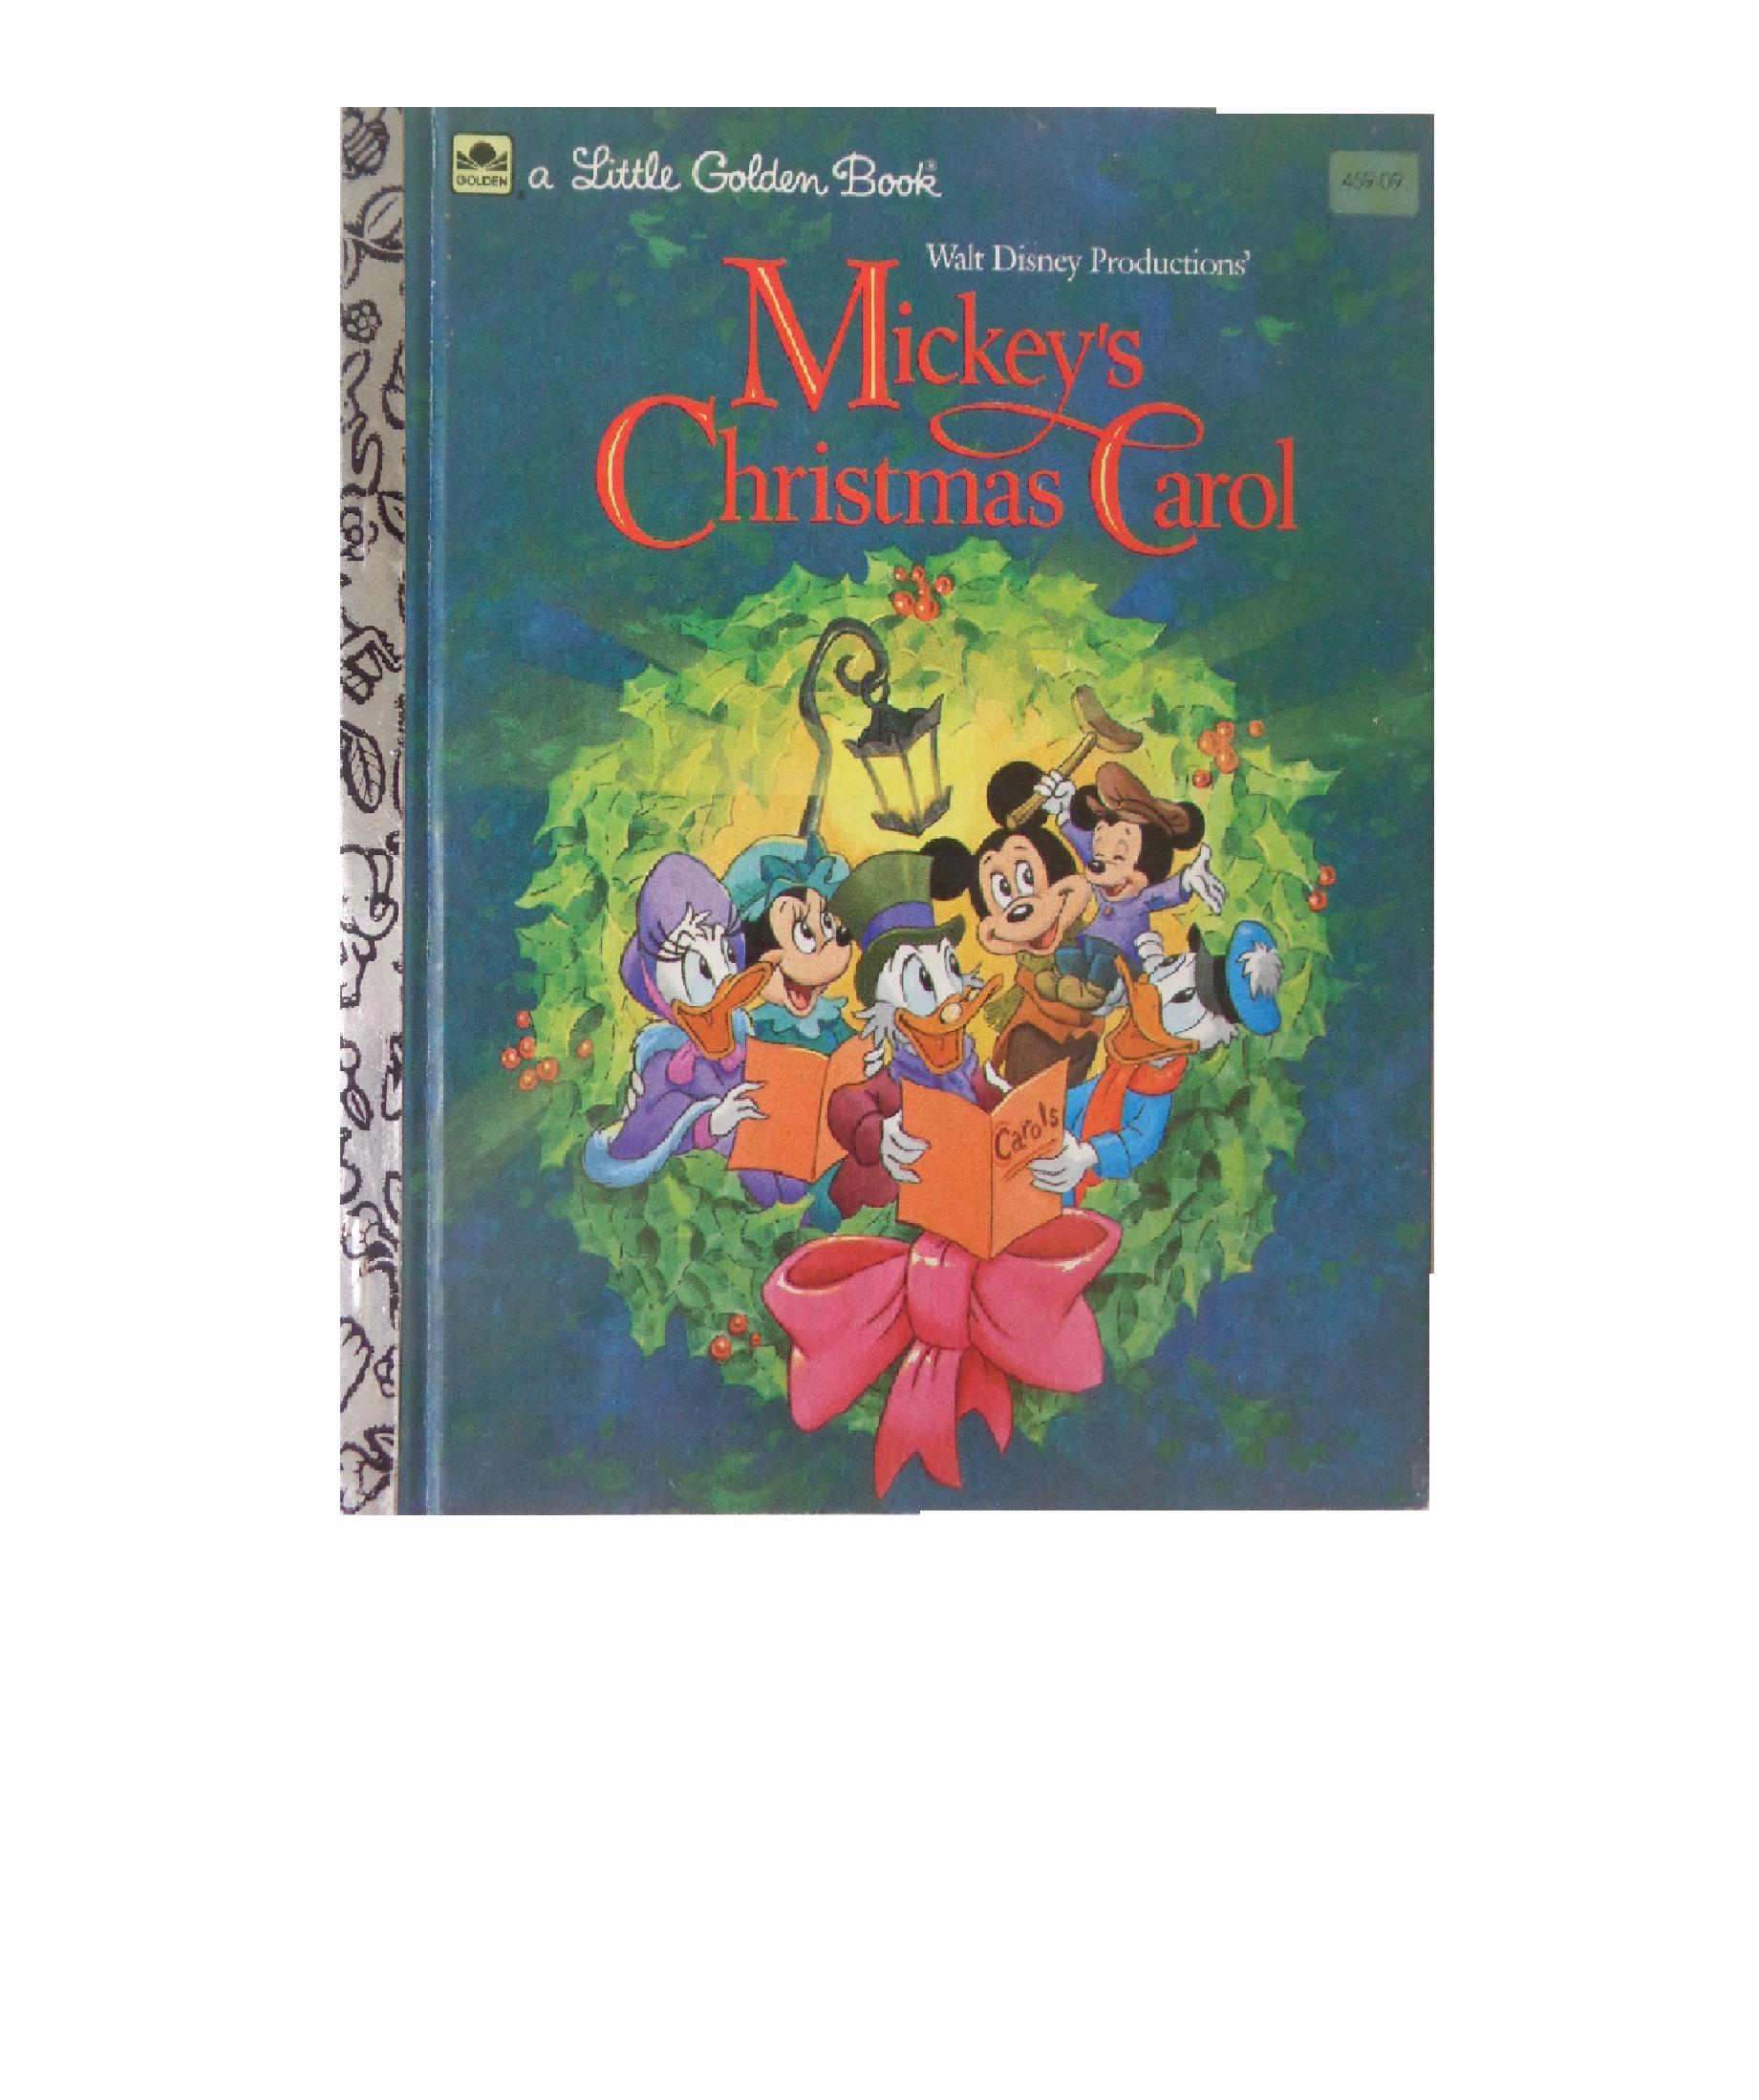 Mickeys Christmas Carol Book.Mickey S Christmas Carol A Little Golden Book 1983 Walt